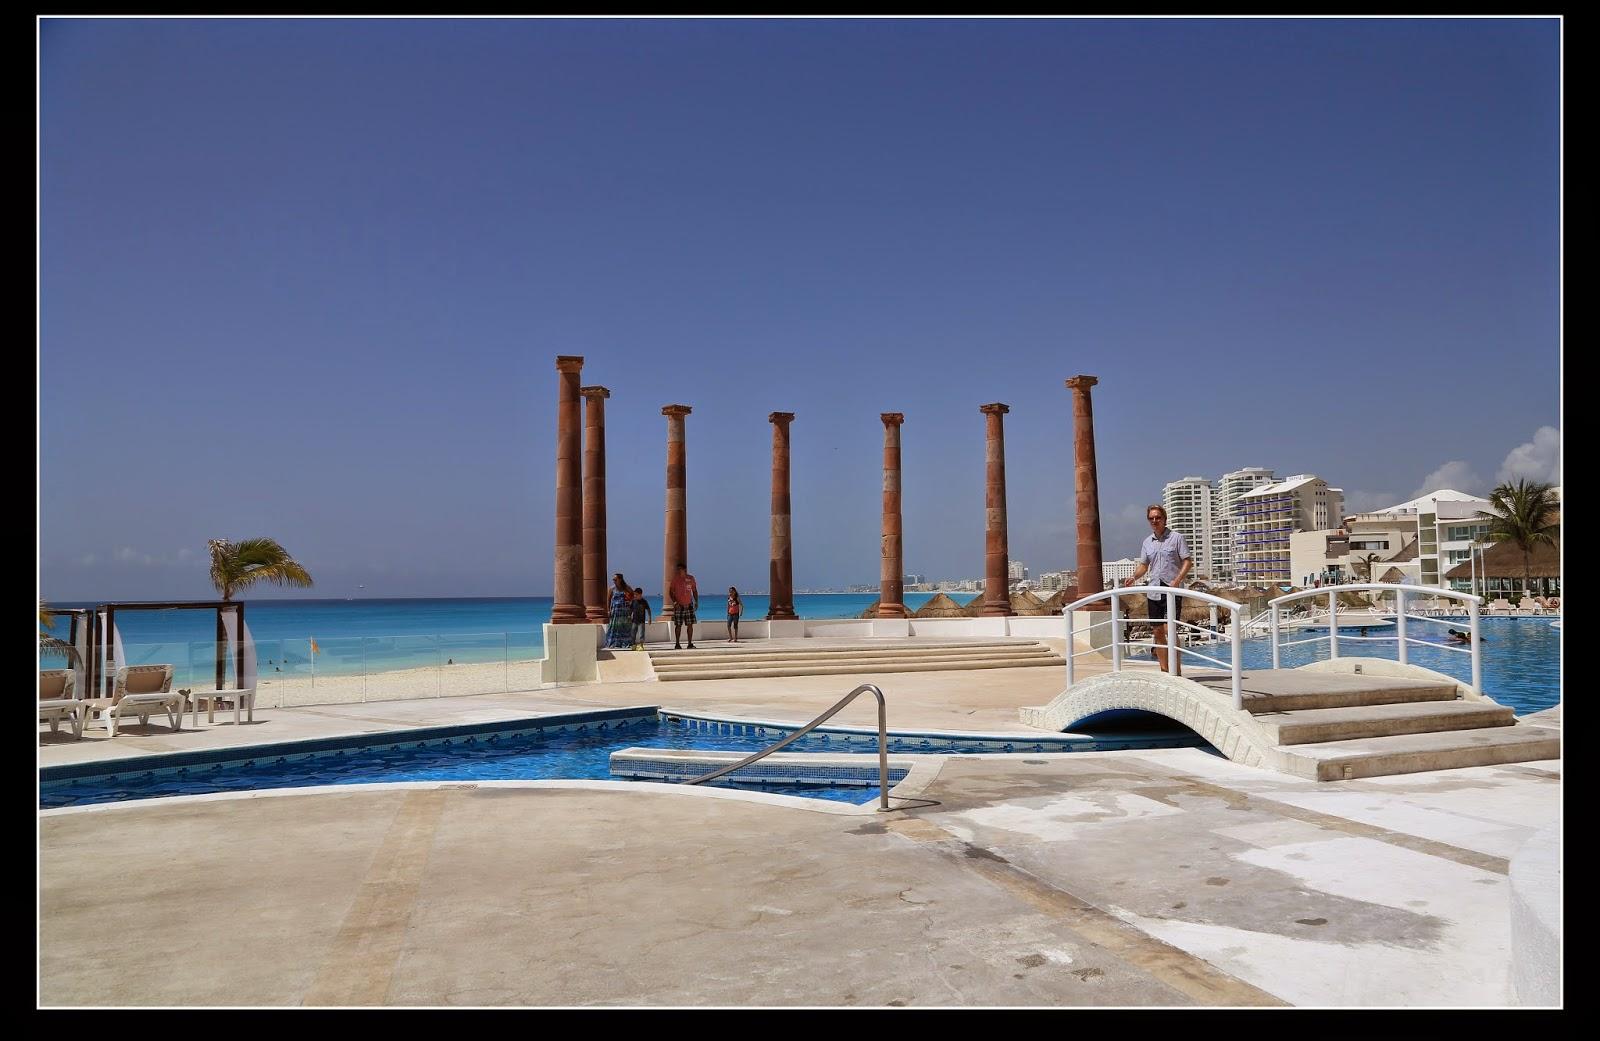 Andrew's Blog: 墨西哥之旅-坎昆(Cancun) 篇